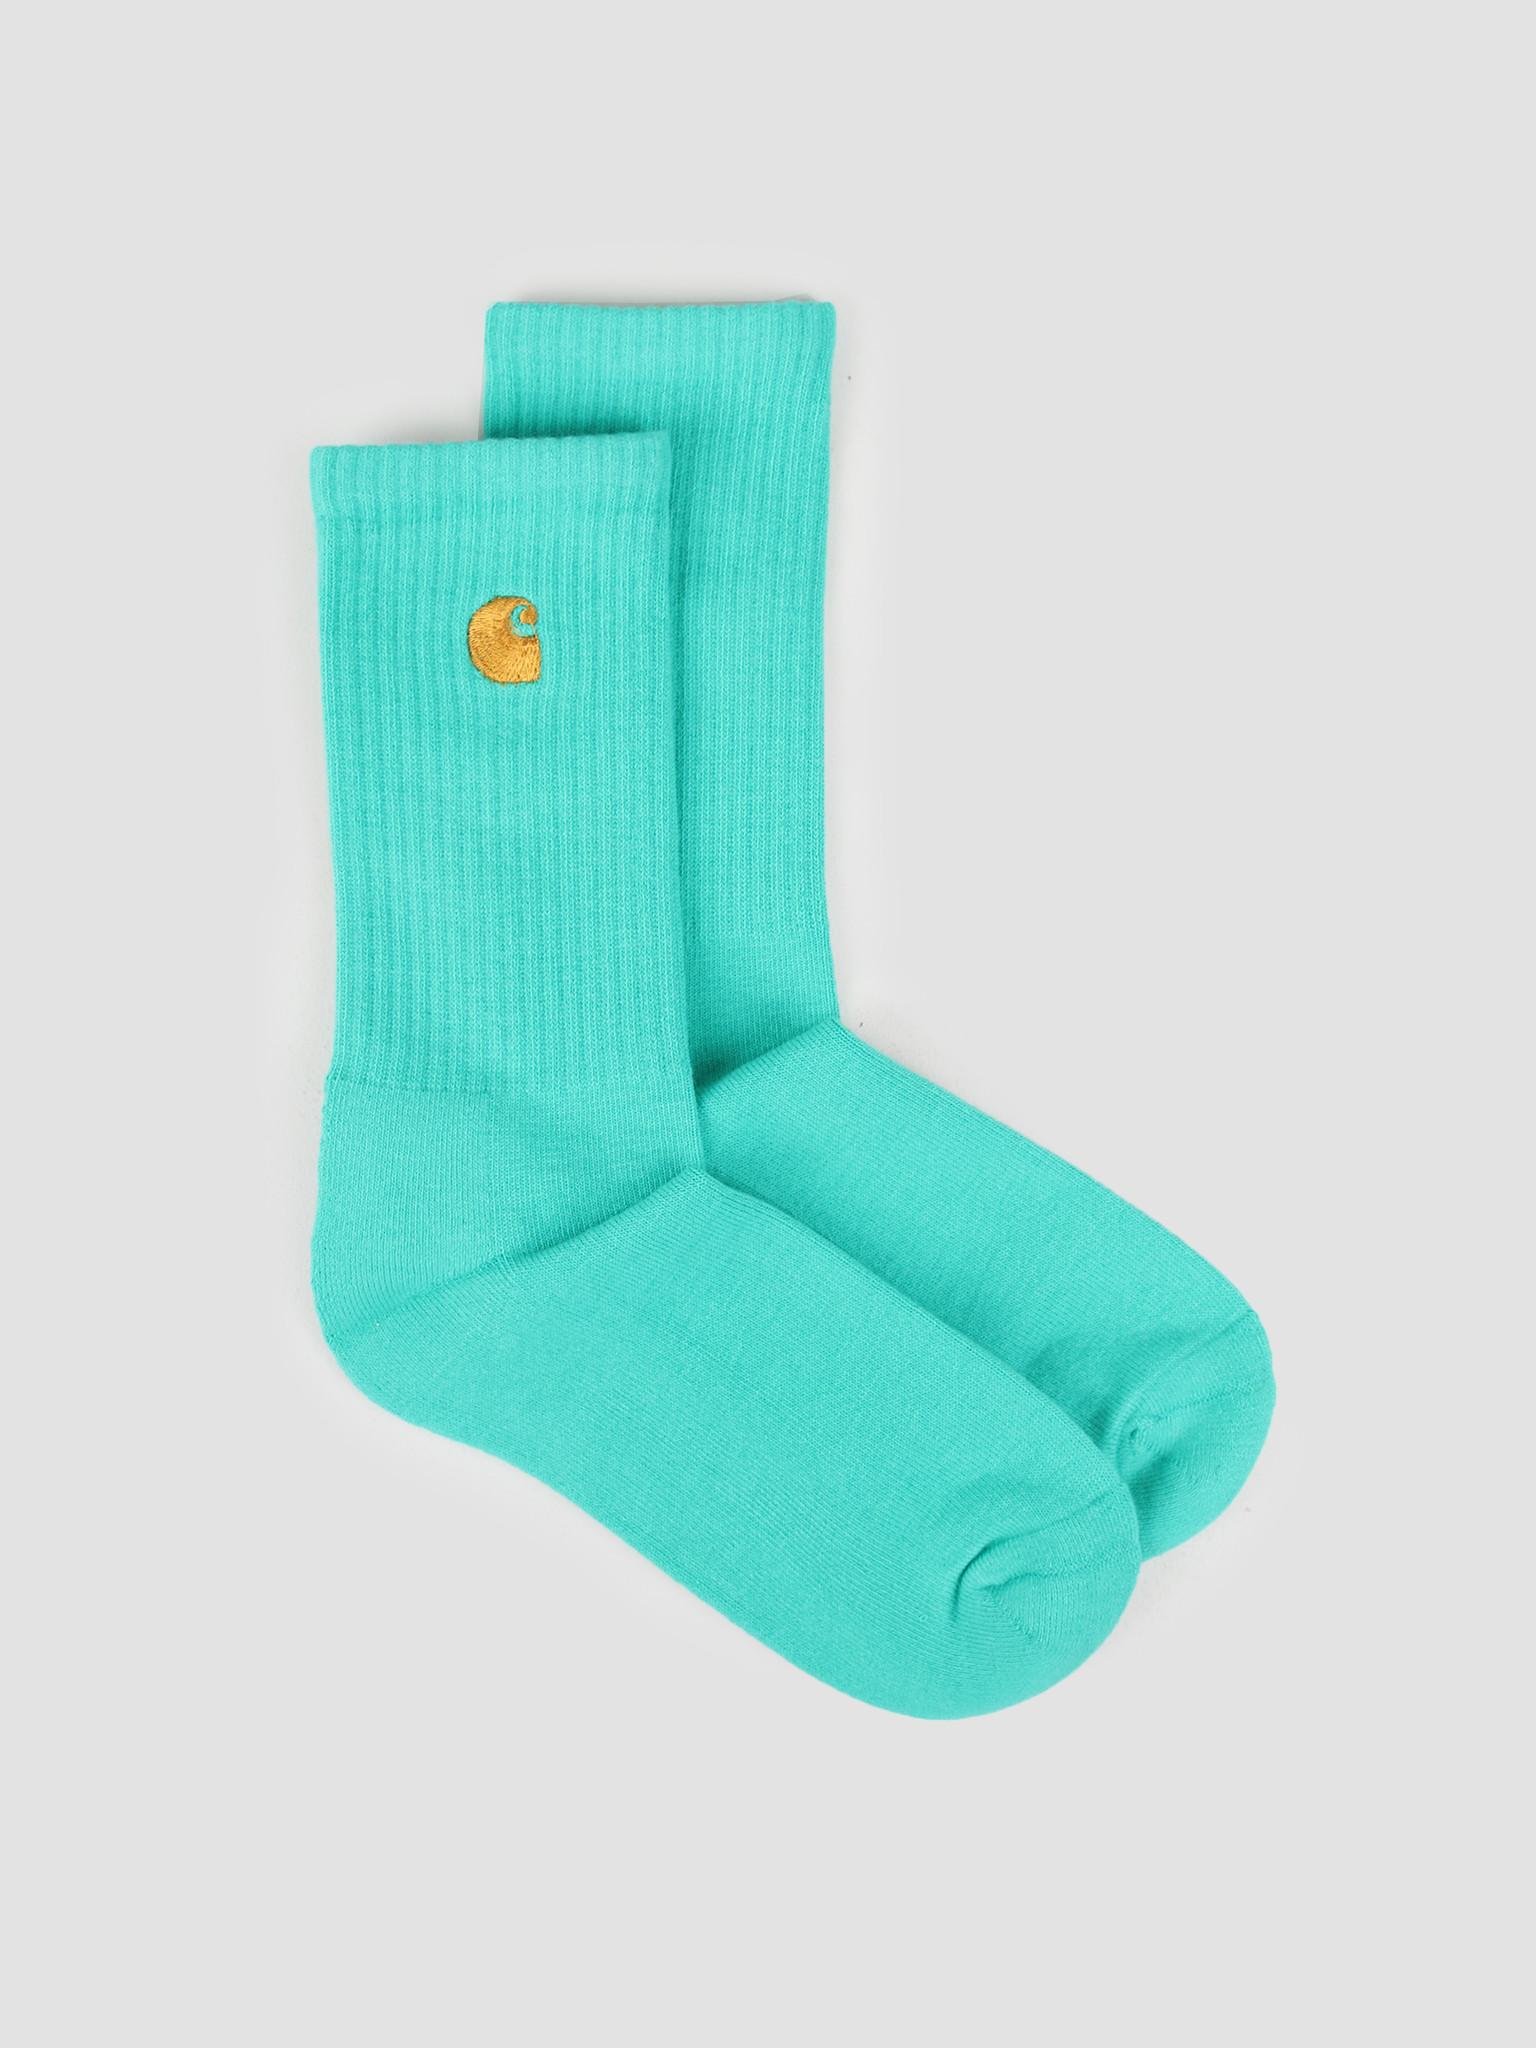 Carhartt WIP Carhartt WIP Chase Socks Yoda Gold  I026527-09A90